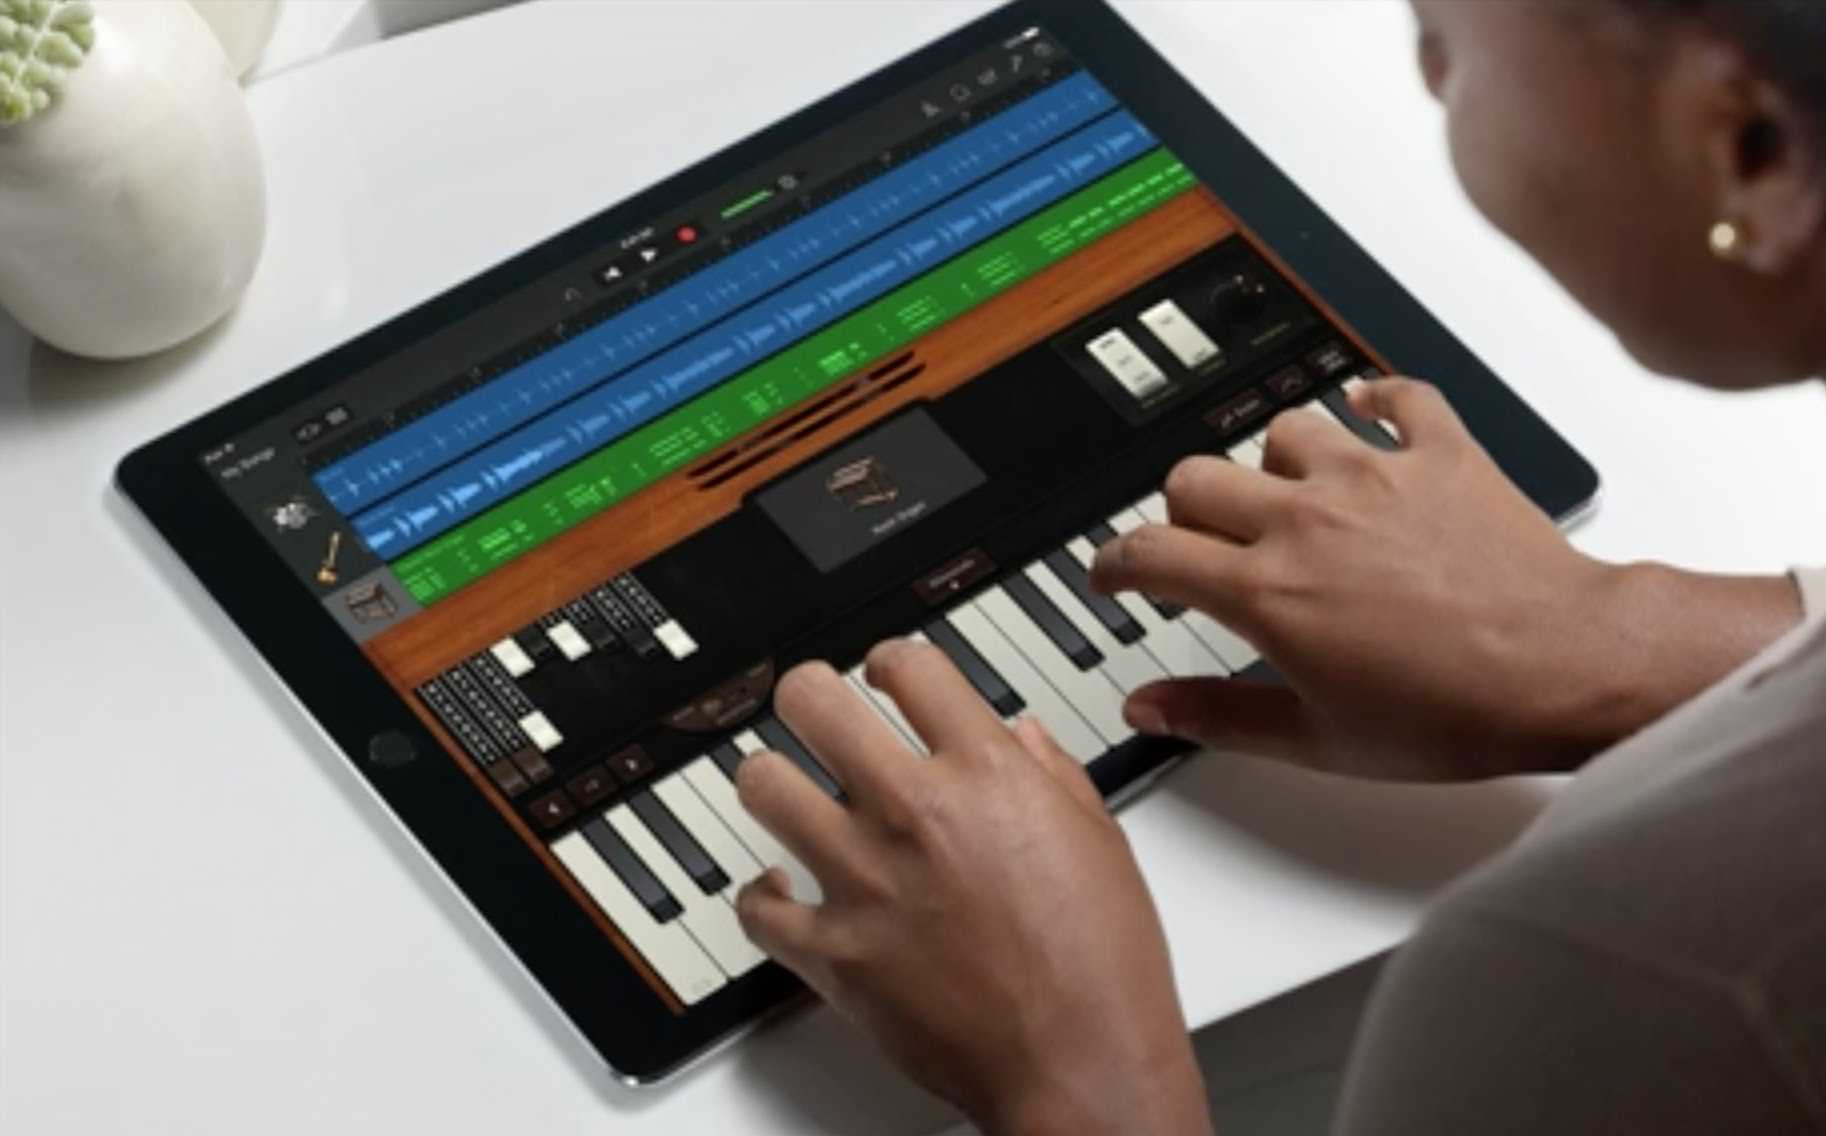 iPad Garage Band Pedro Topete Apple Blog Portugal